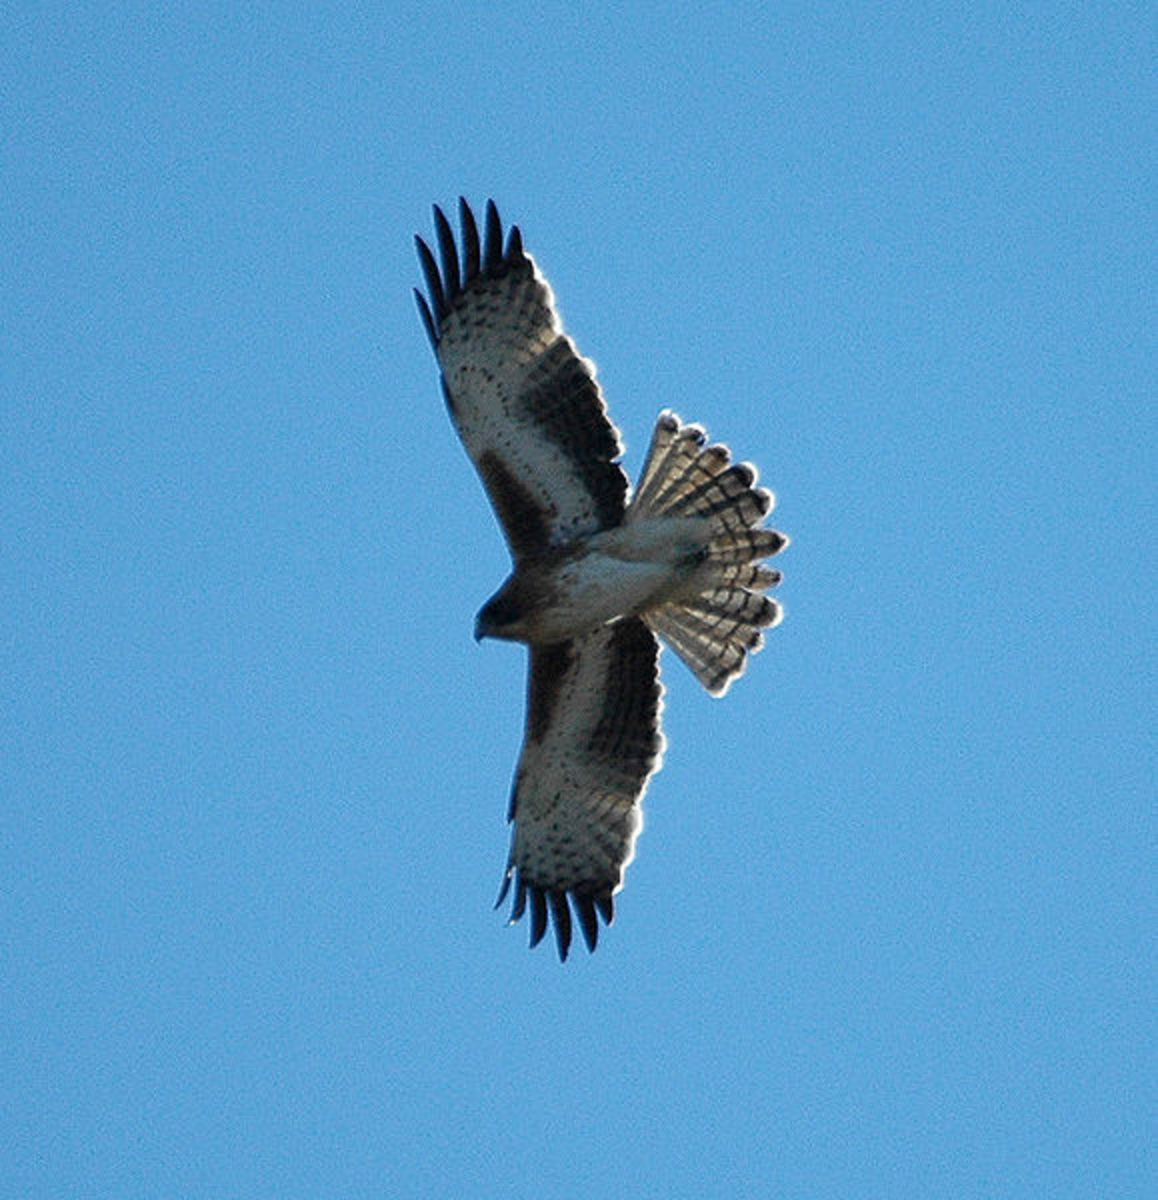 The little eagle